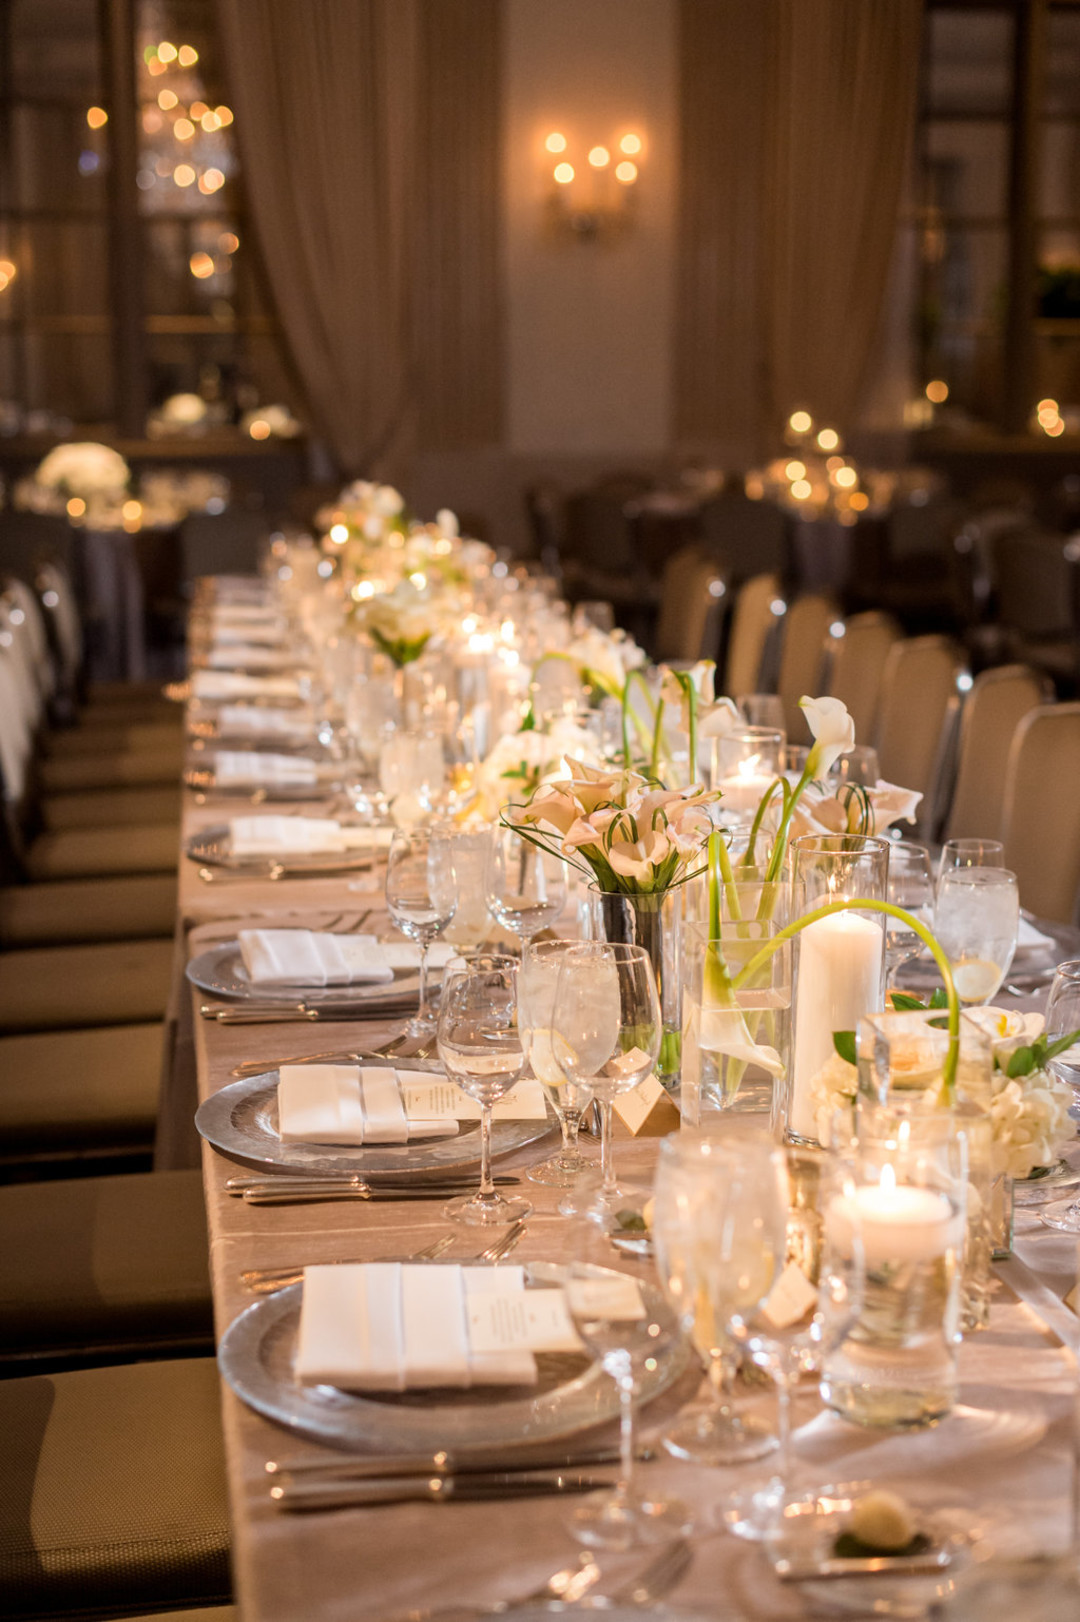 Elegant Table Setting The Standard Room Chicago Wedding Julia Franzosa Photography